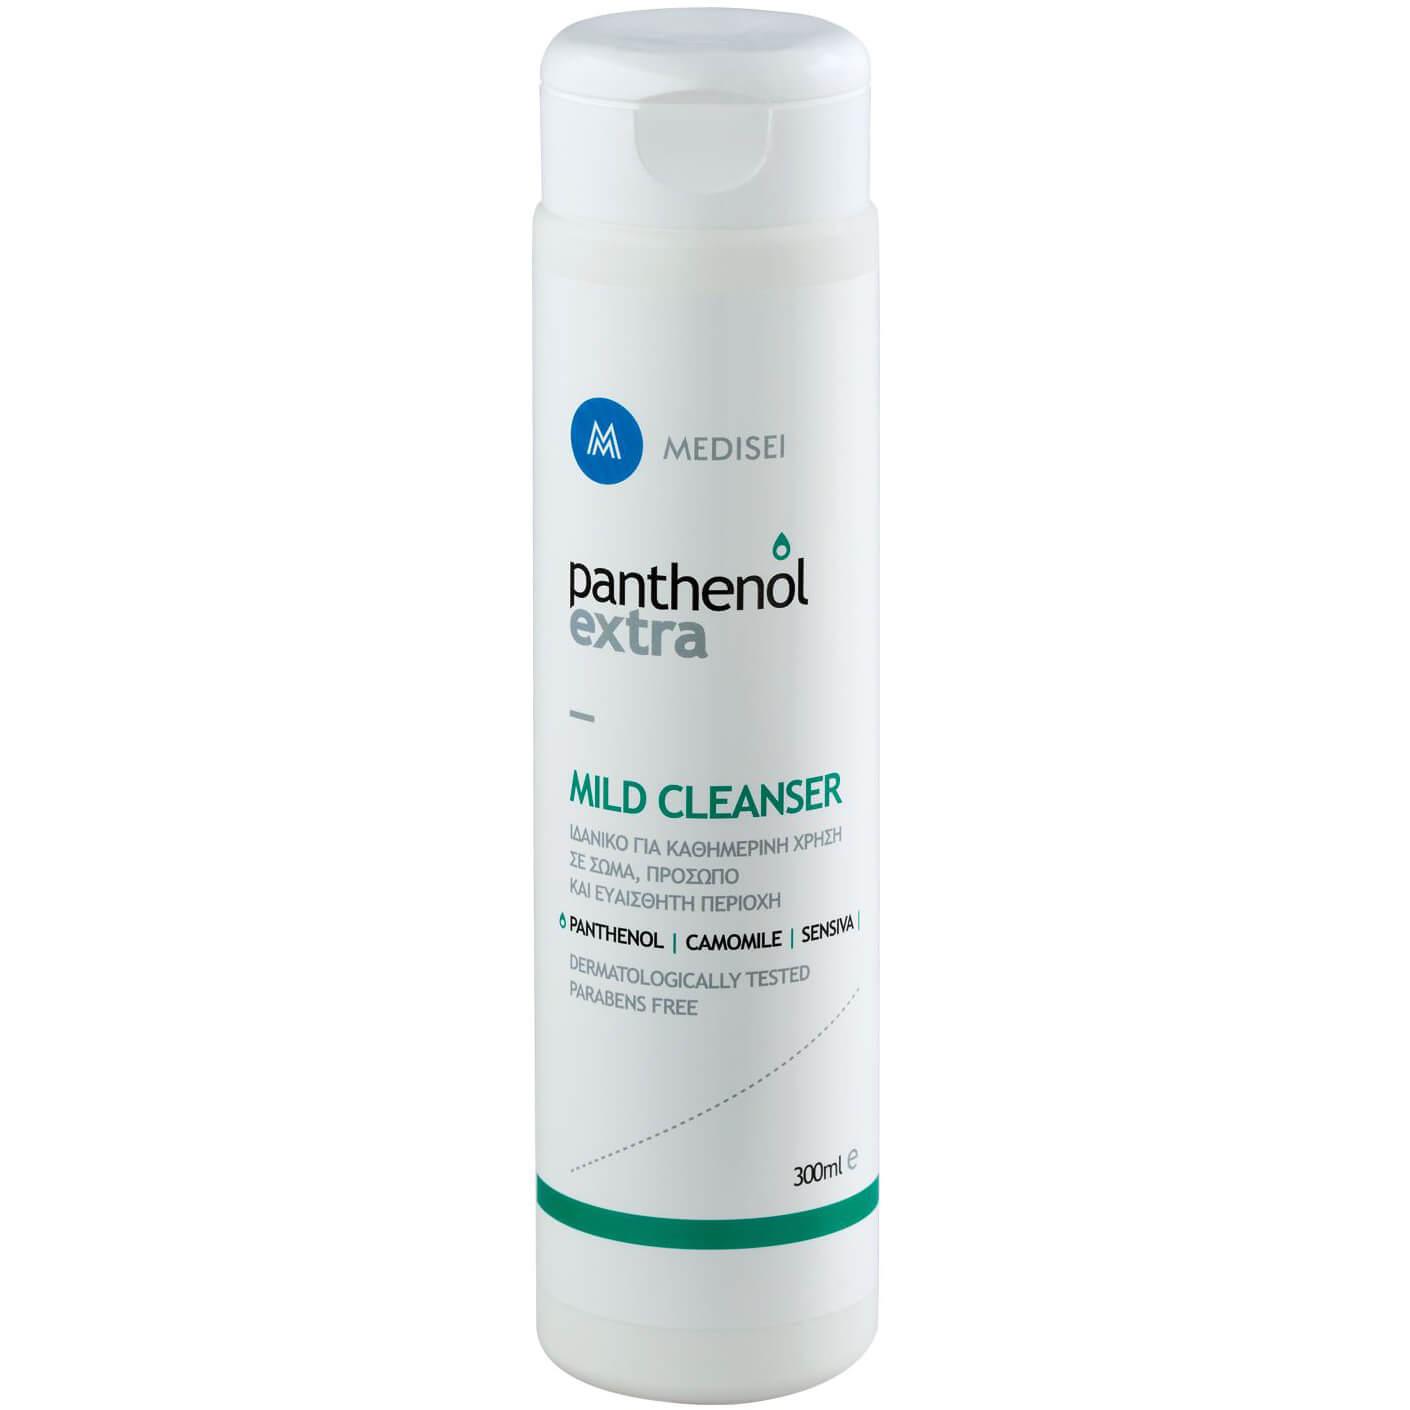 Medisei Panthenol Extra Mild Cleanser Απαλό Καθαριστικό για Πρόσωπο, Σώμα & Ευαίσθητη Περιοχή 300ml